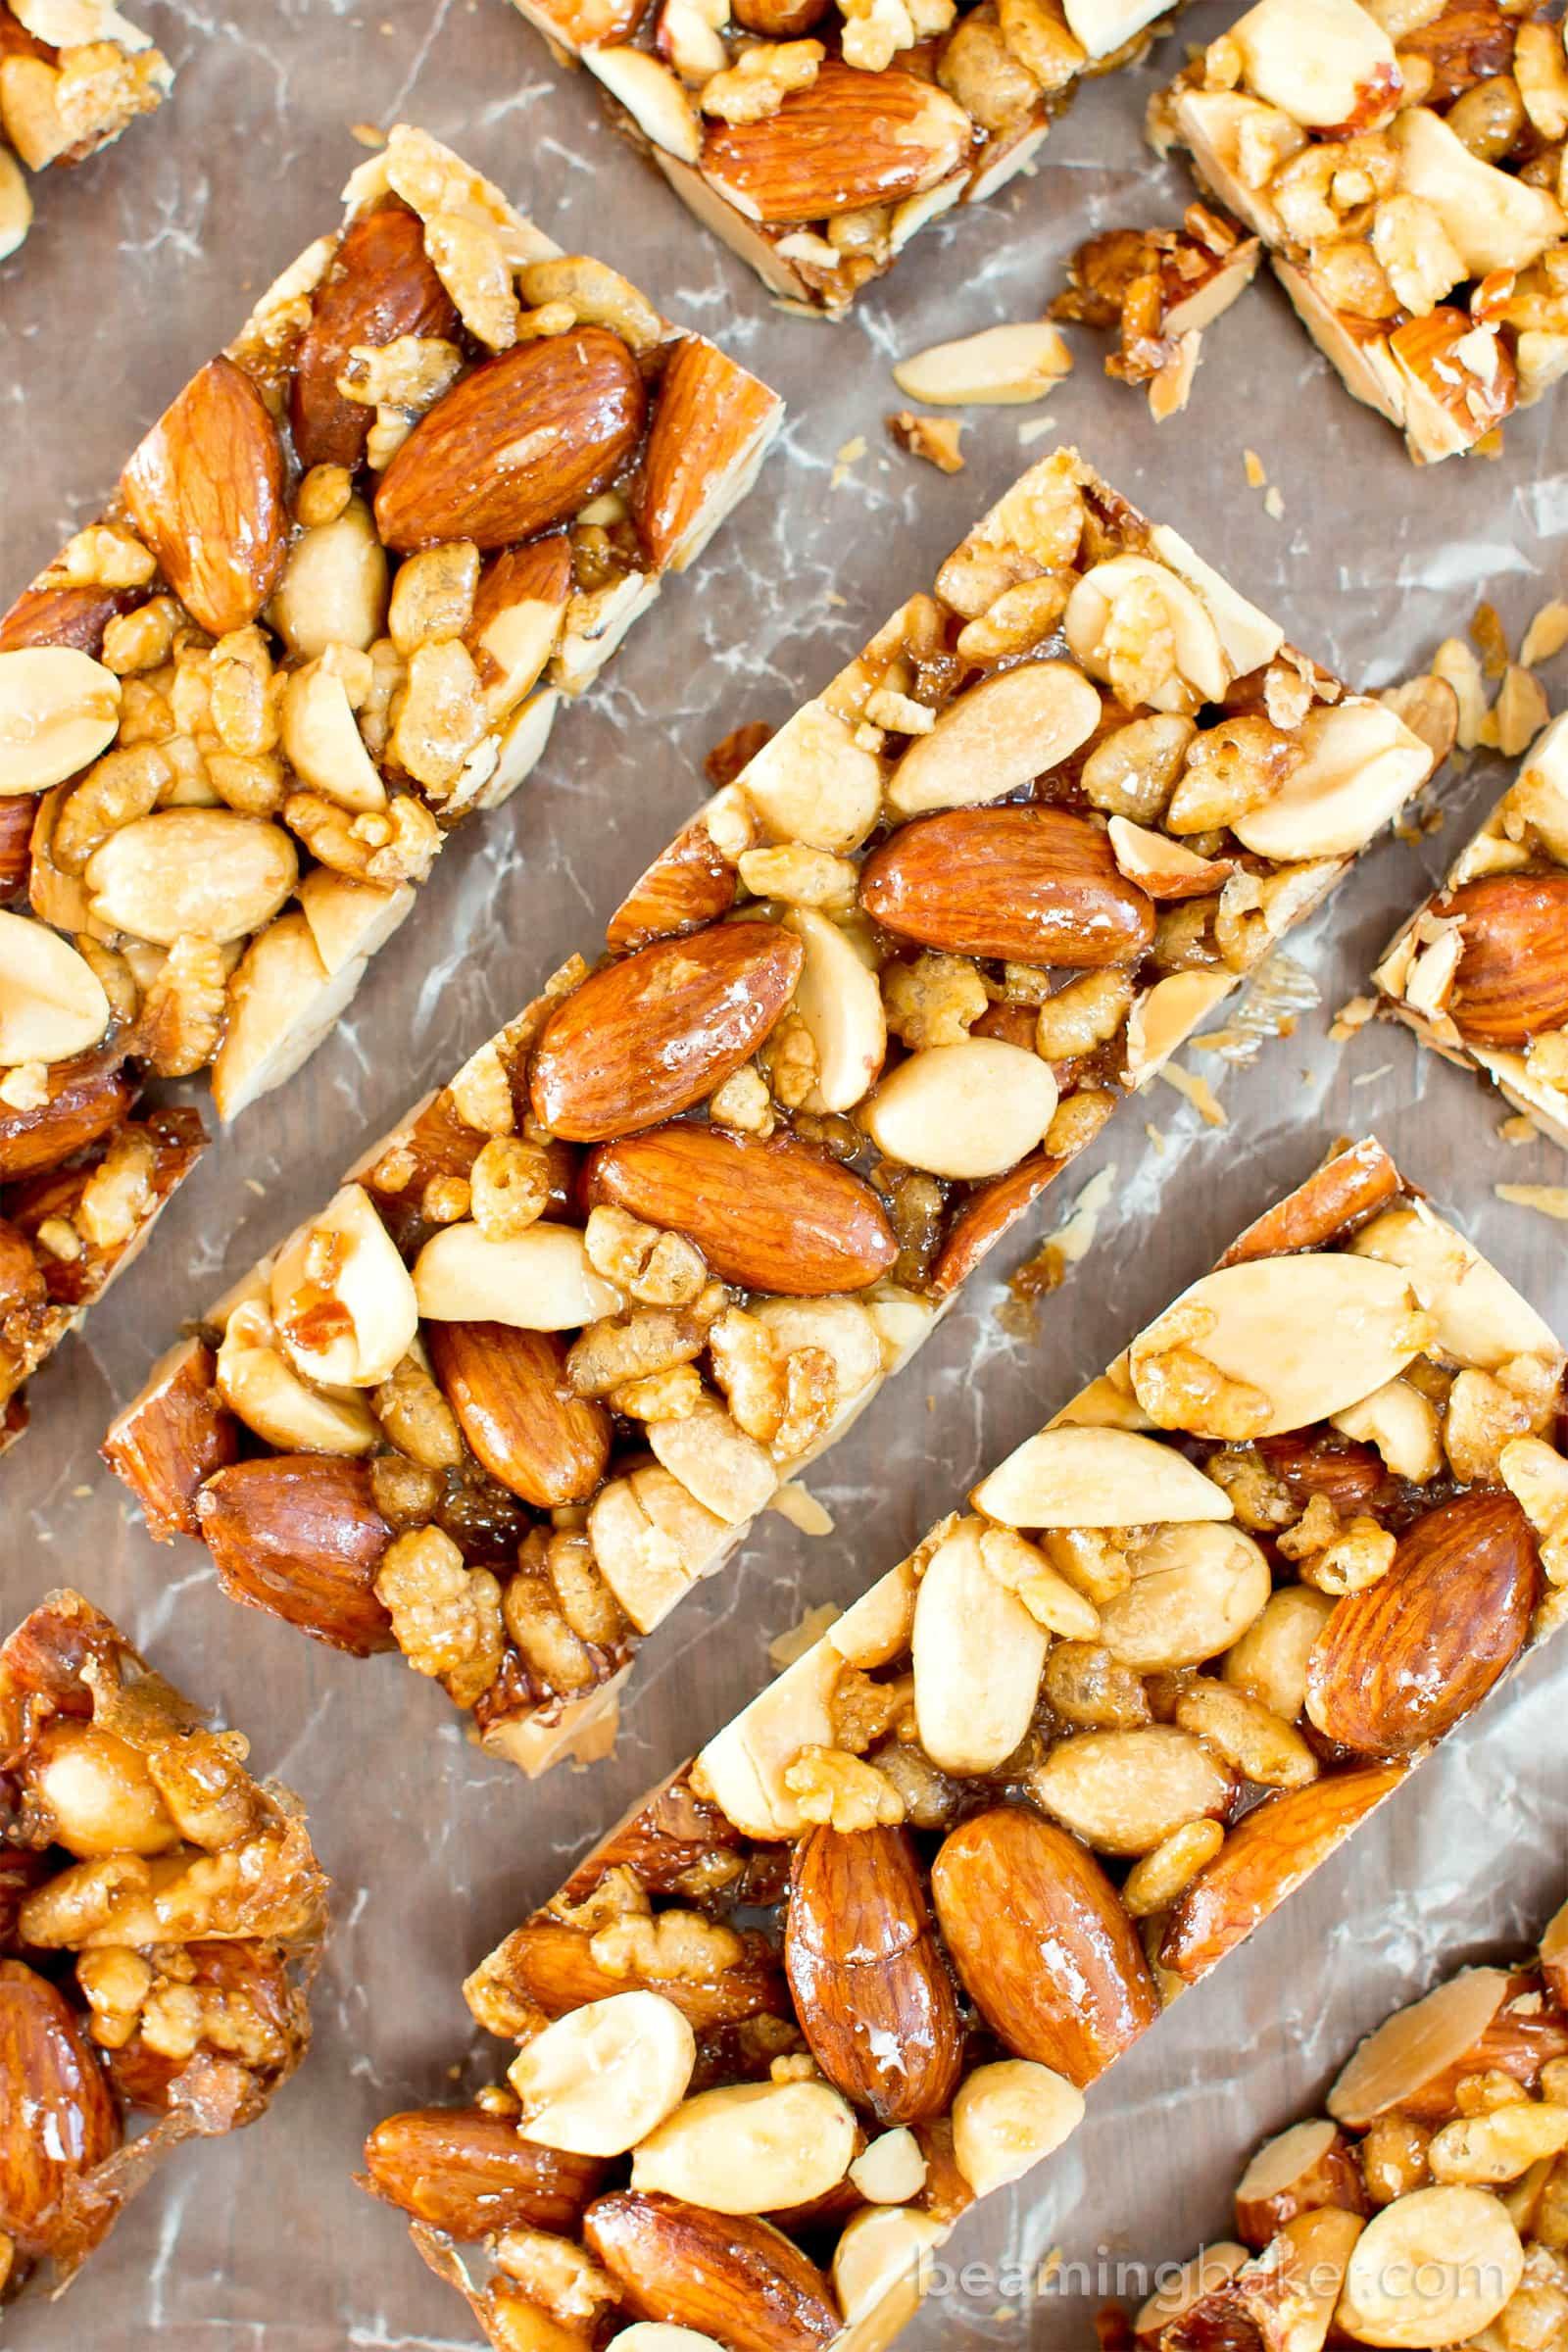 Healthy Homemade Snacks  15 Easy Healthy Gluten Free Vegan Snack Recipes Beaming